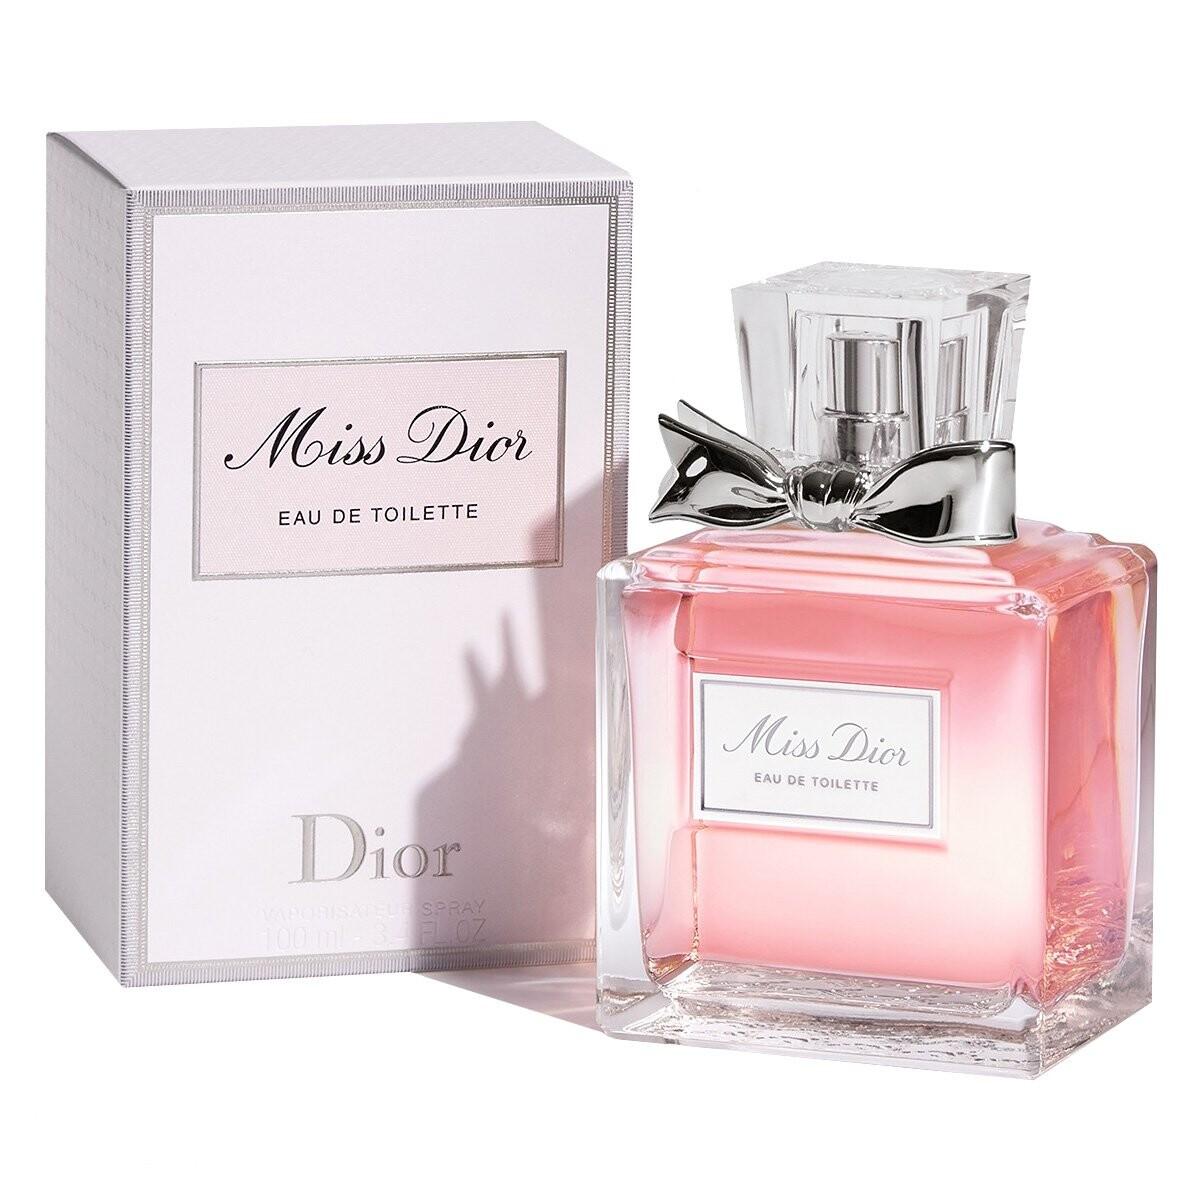 Christian Dior Miss Dior Eau De Toilette 2019